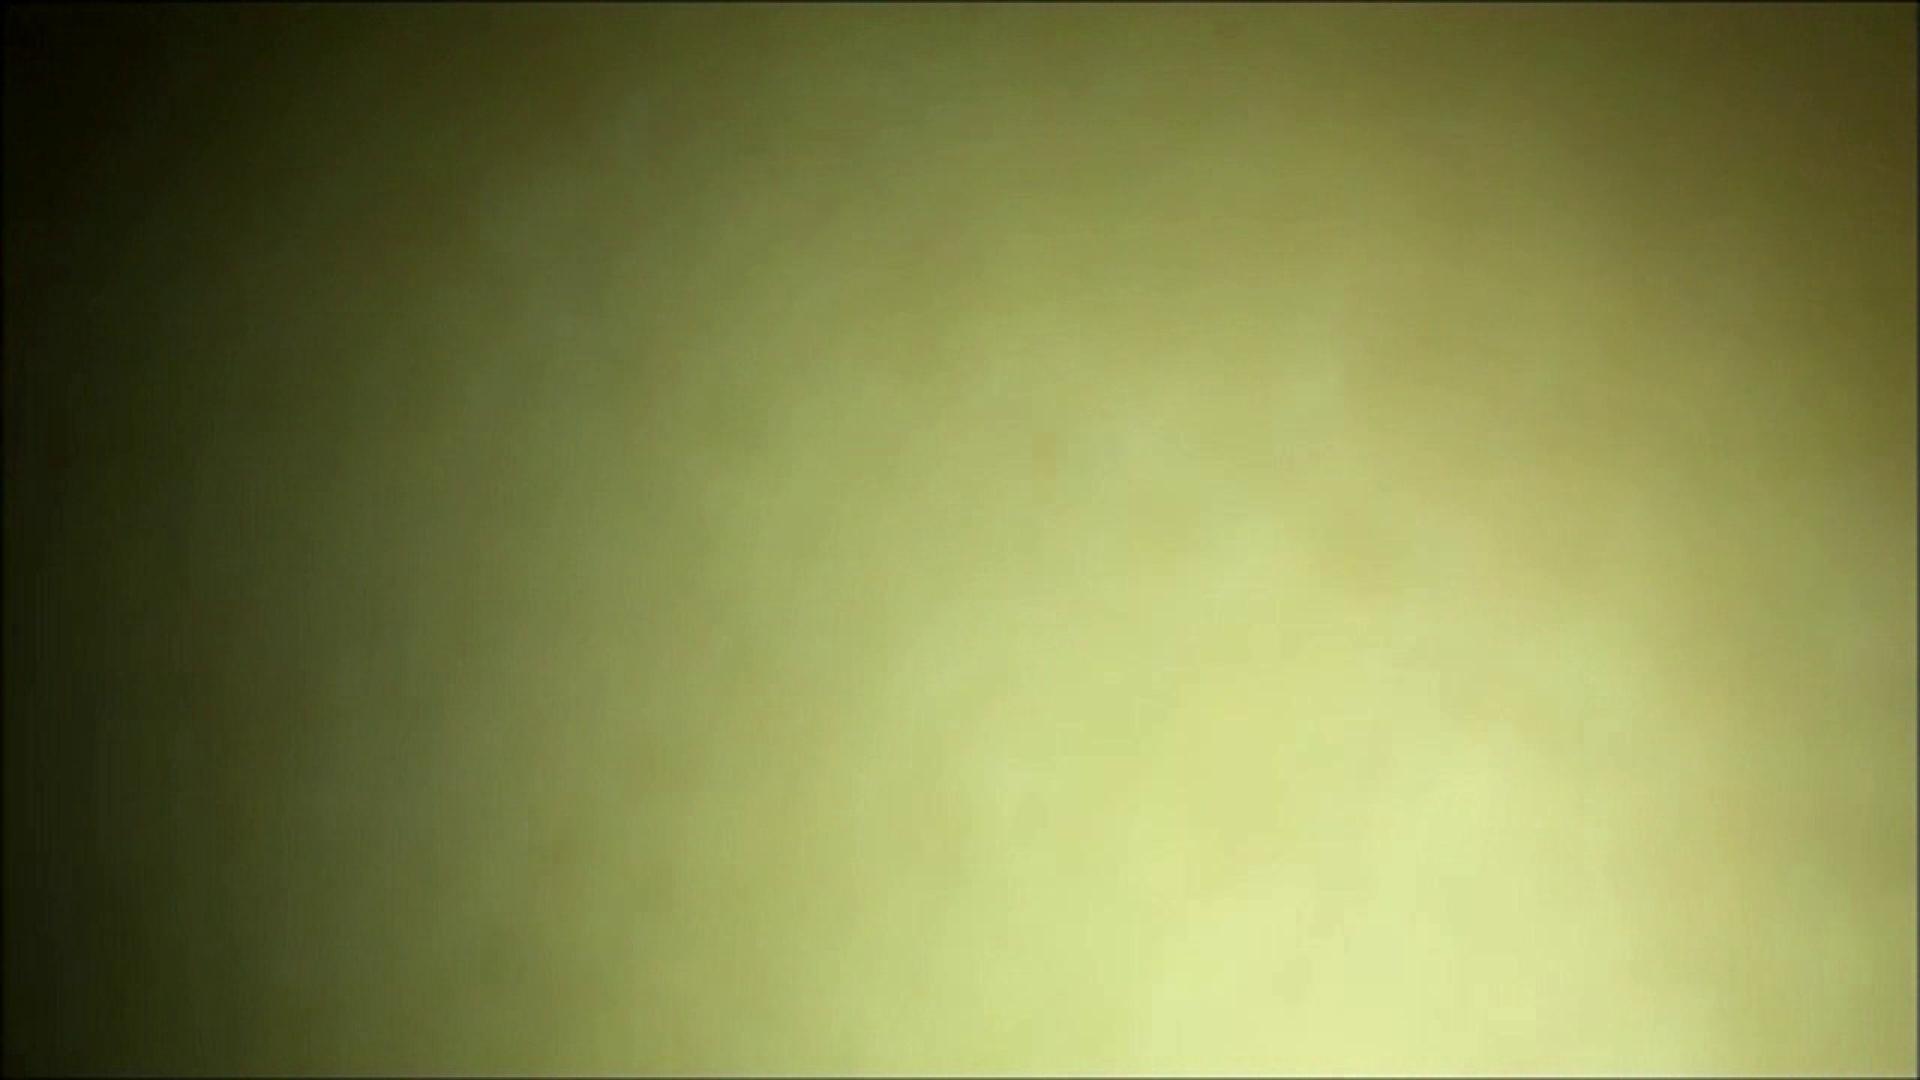 vol.18 【NSちゃん(2回目)】エステティシャン23歳 完全体成功! 友人・知人  84PIX 6